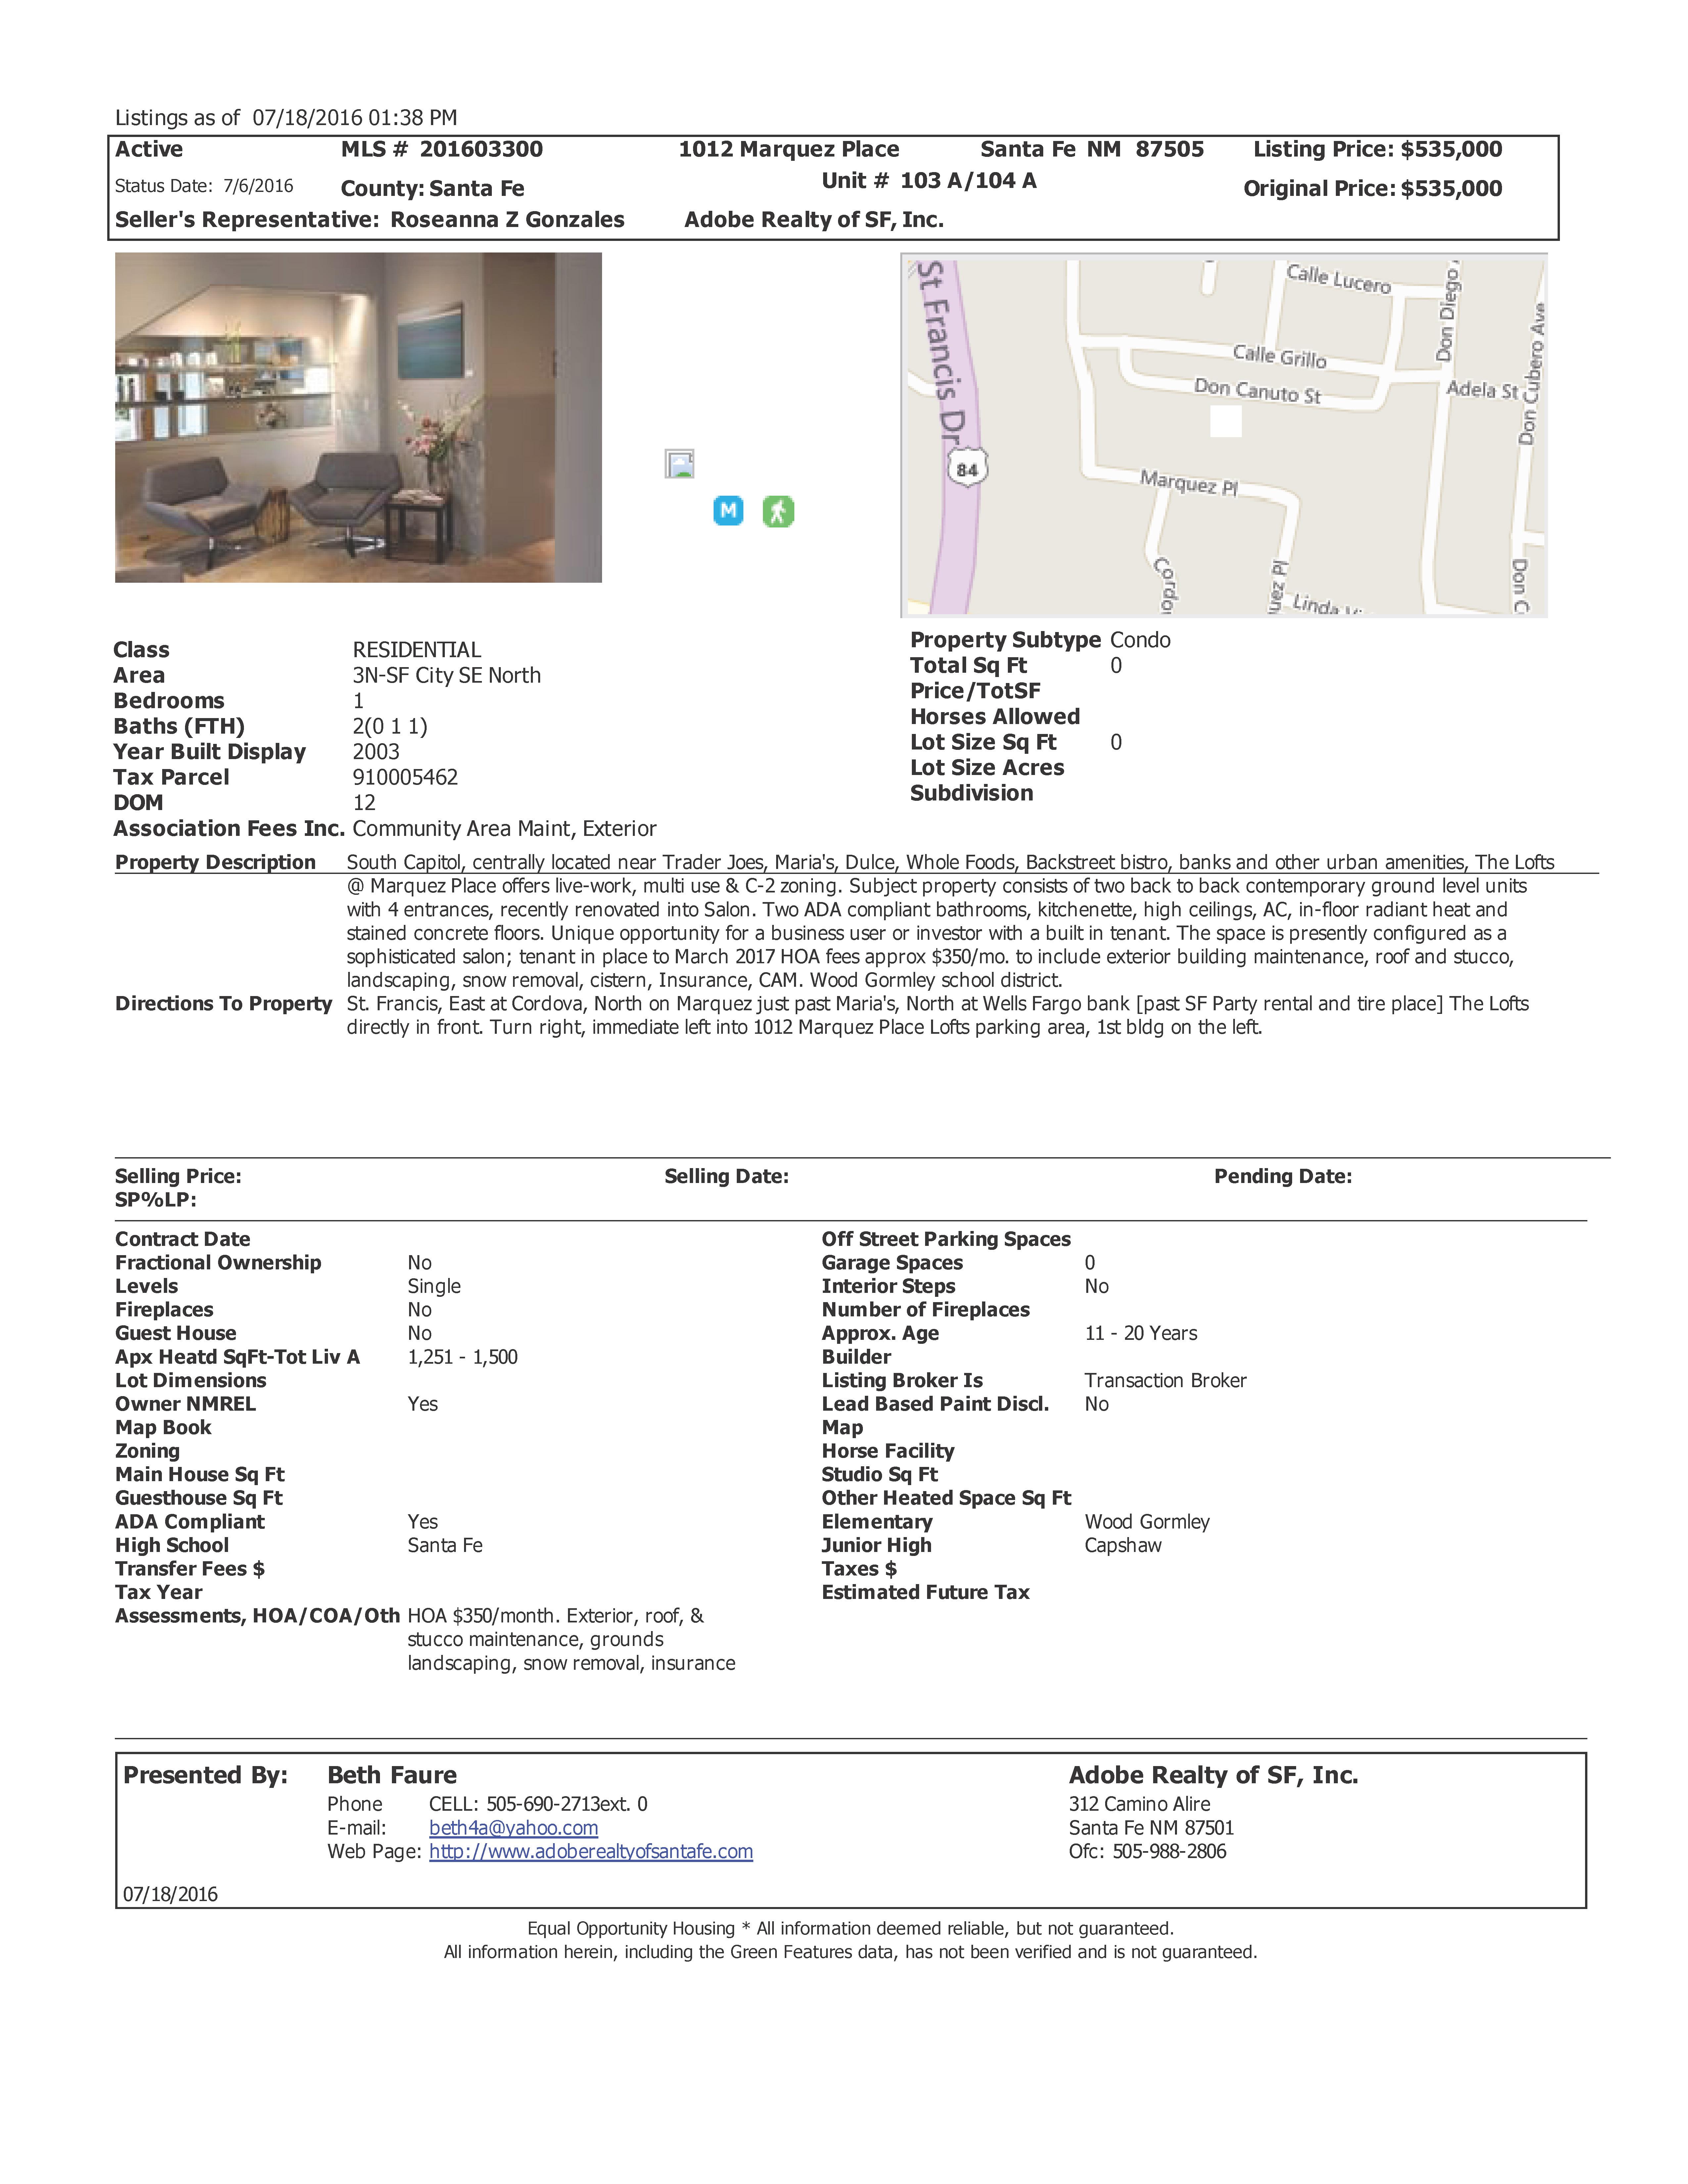 Lofts at Marquez Place_Page_1